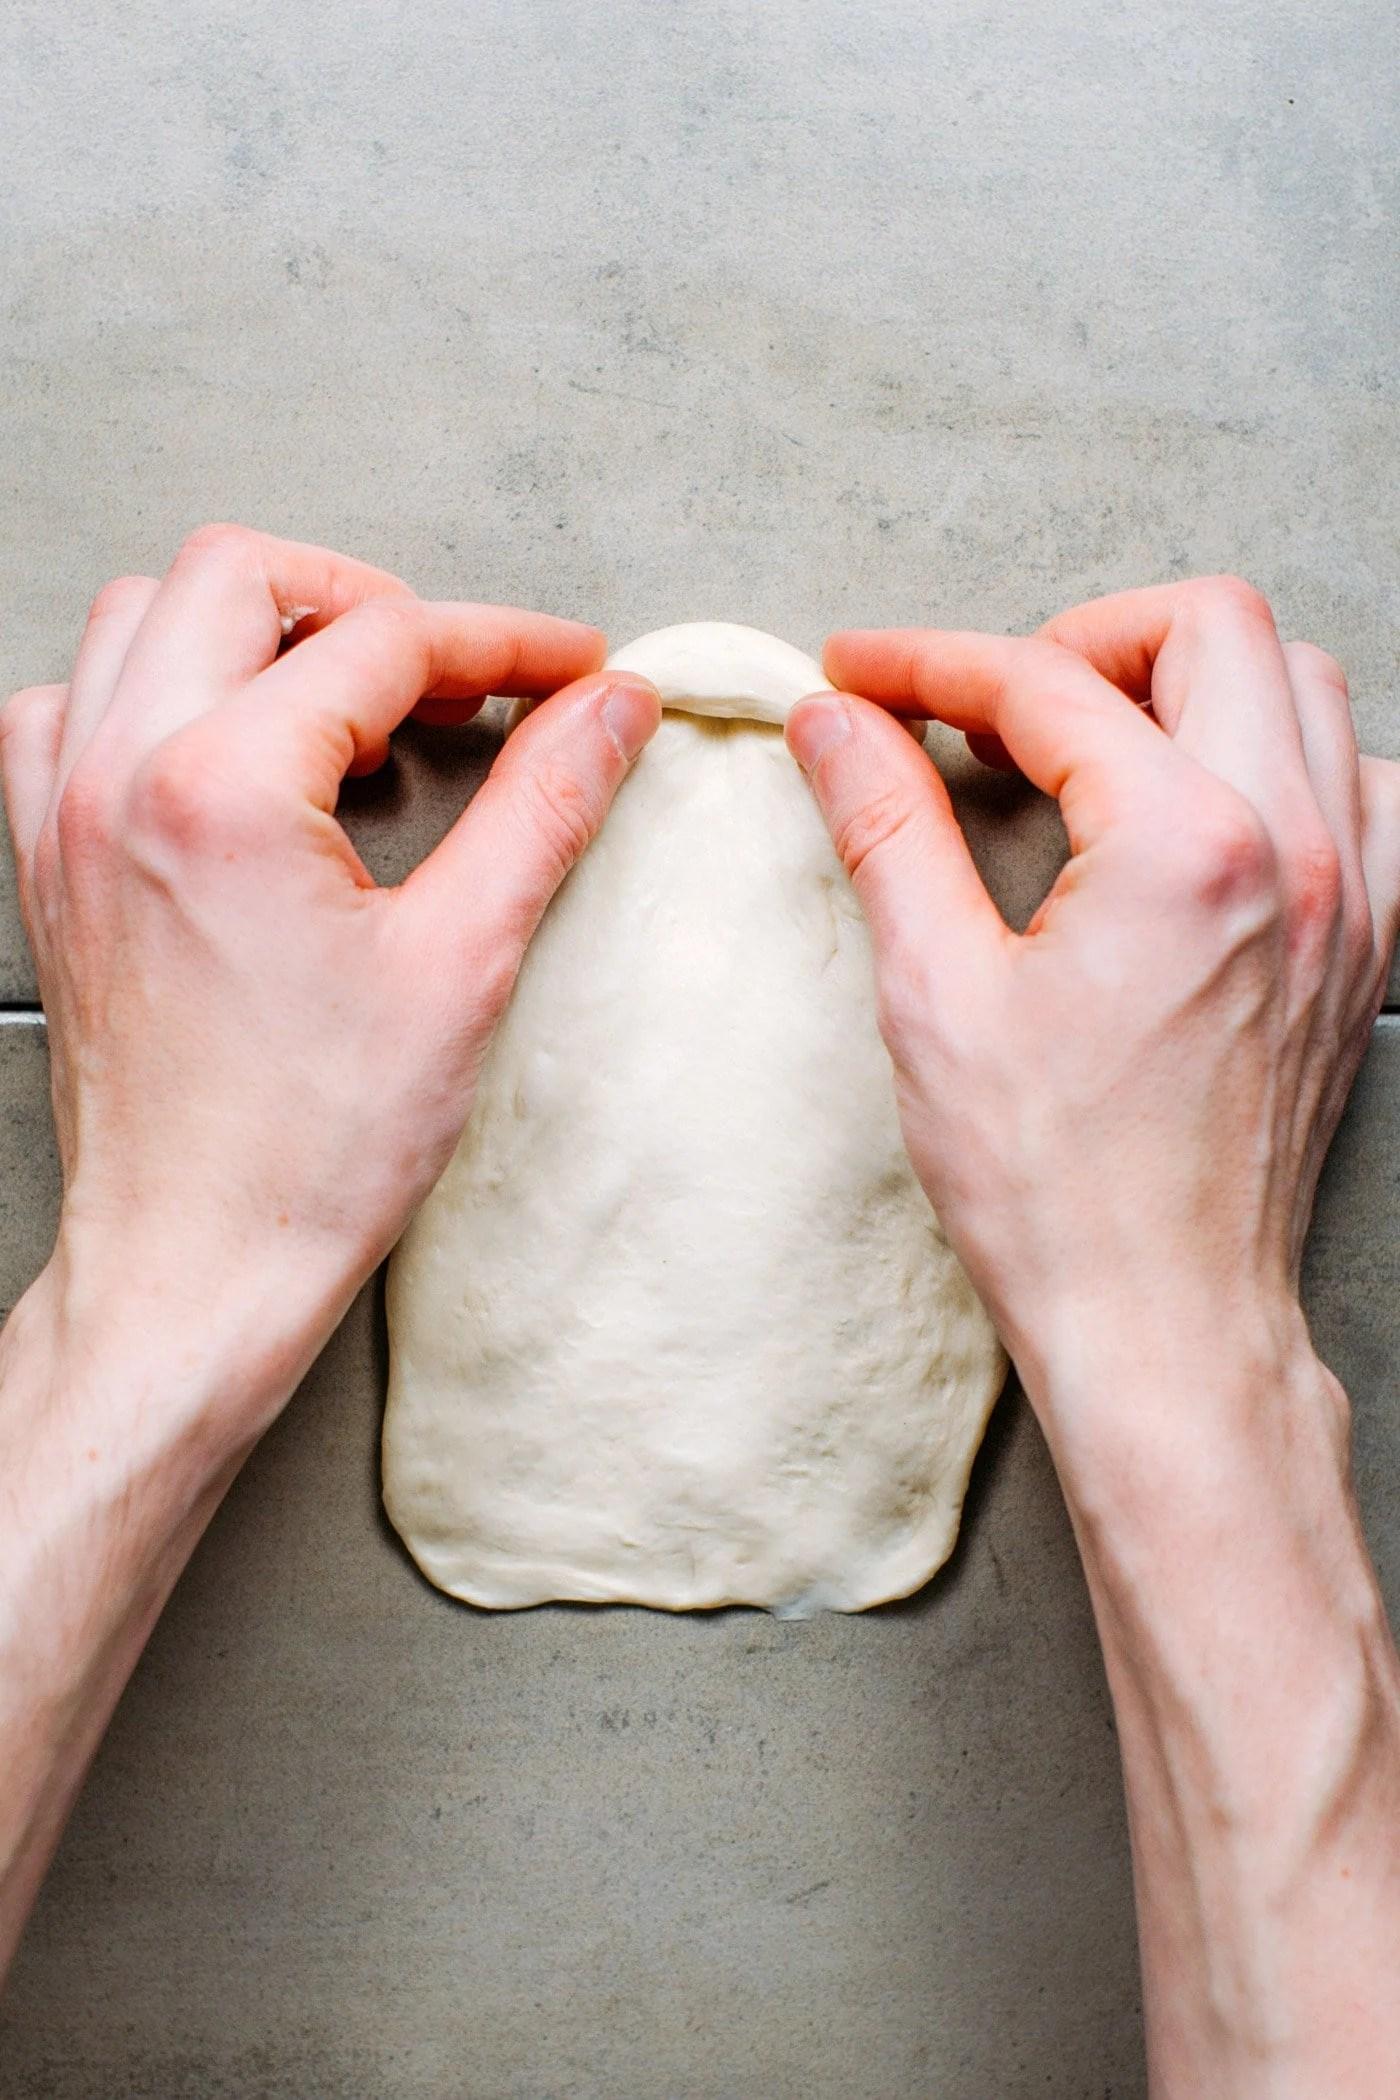 How To Make Bánh Mì (Vietnamese Baguette)